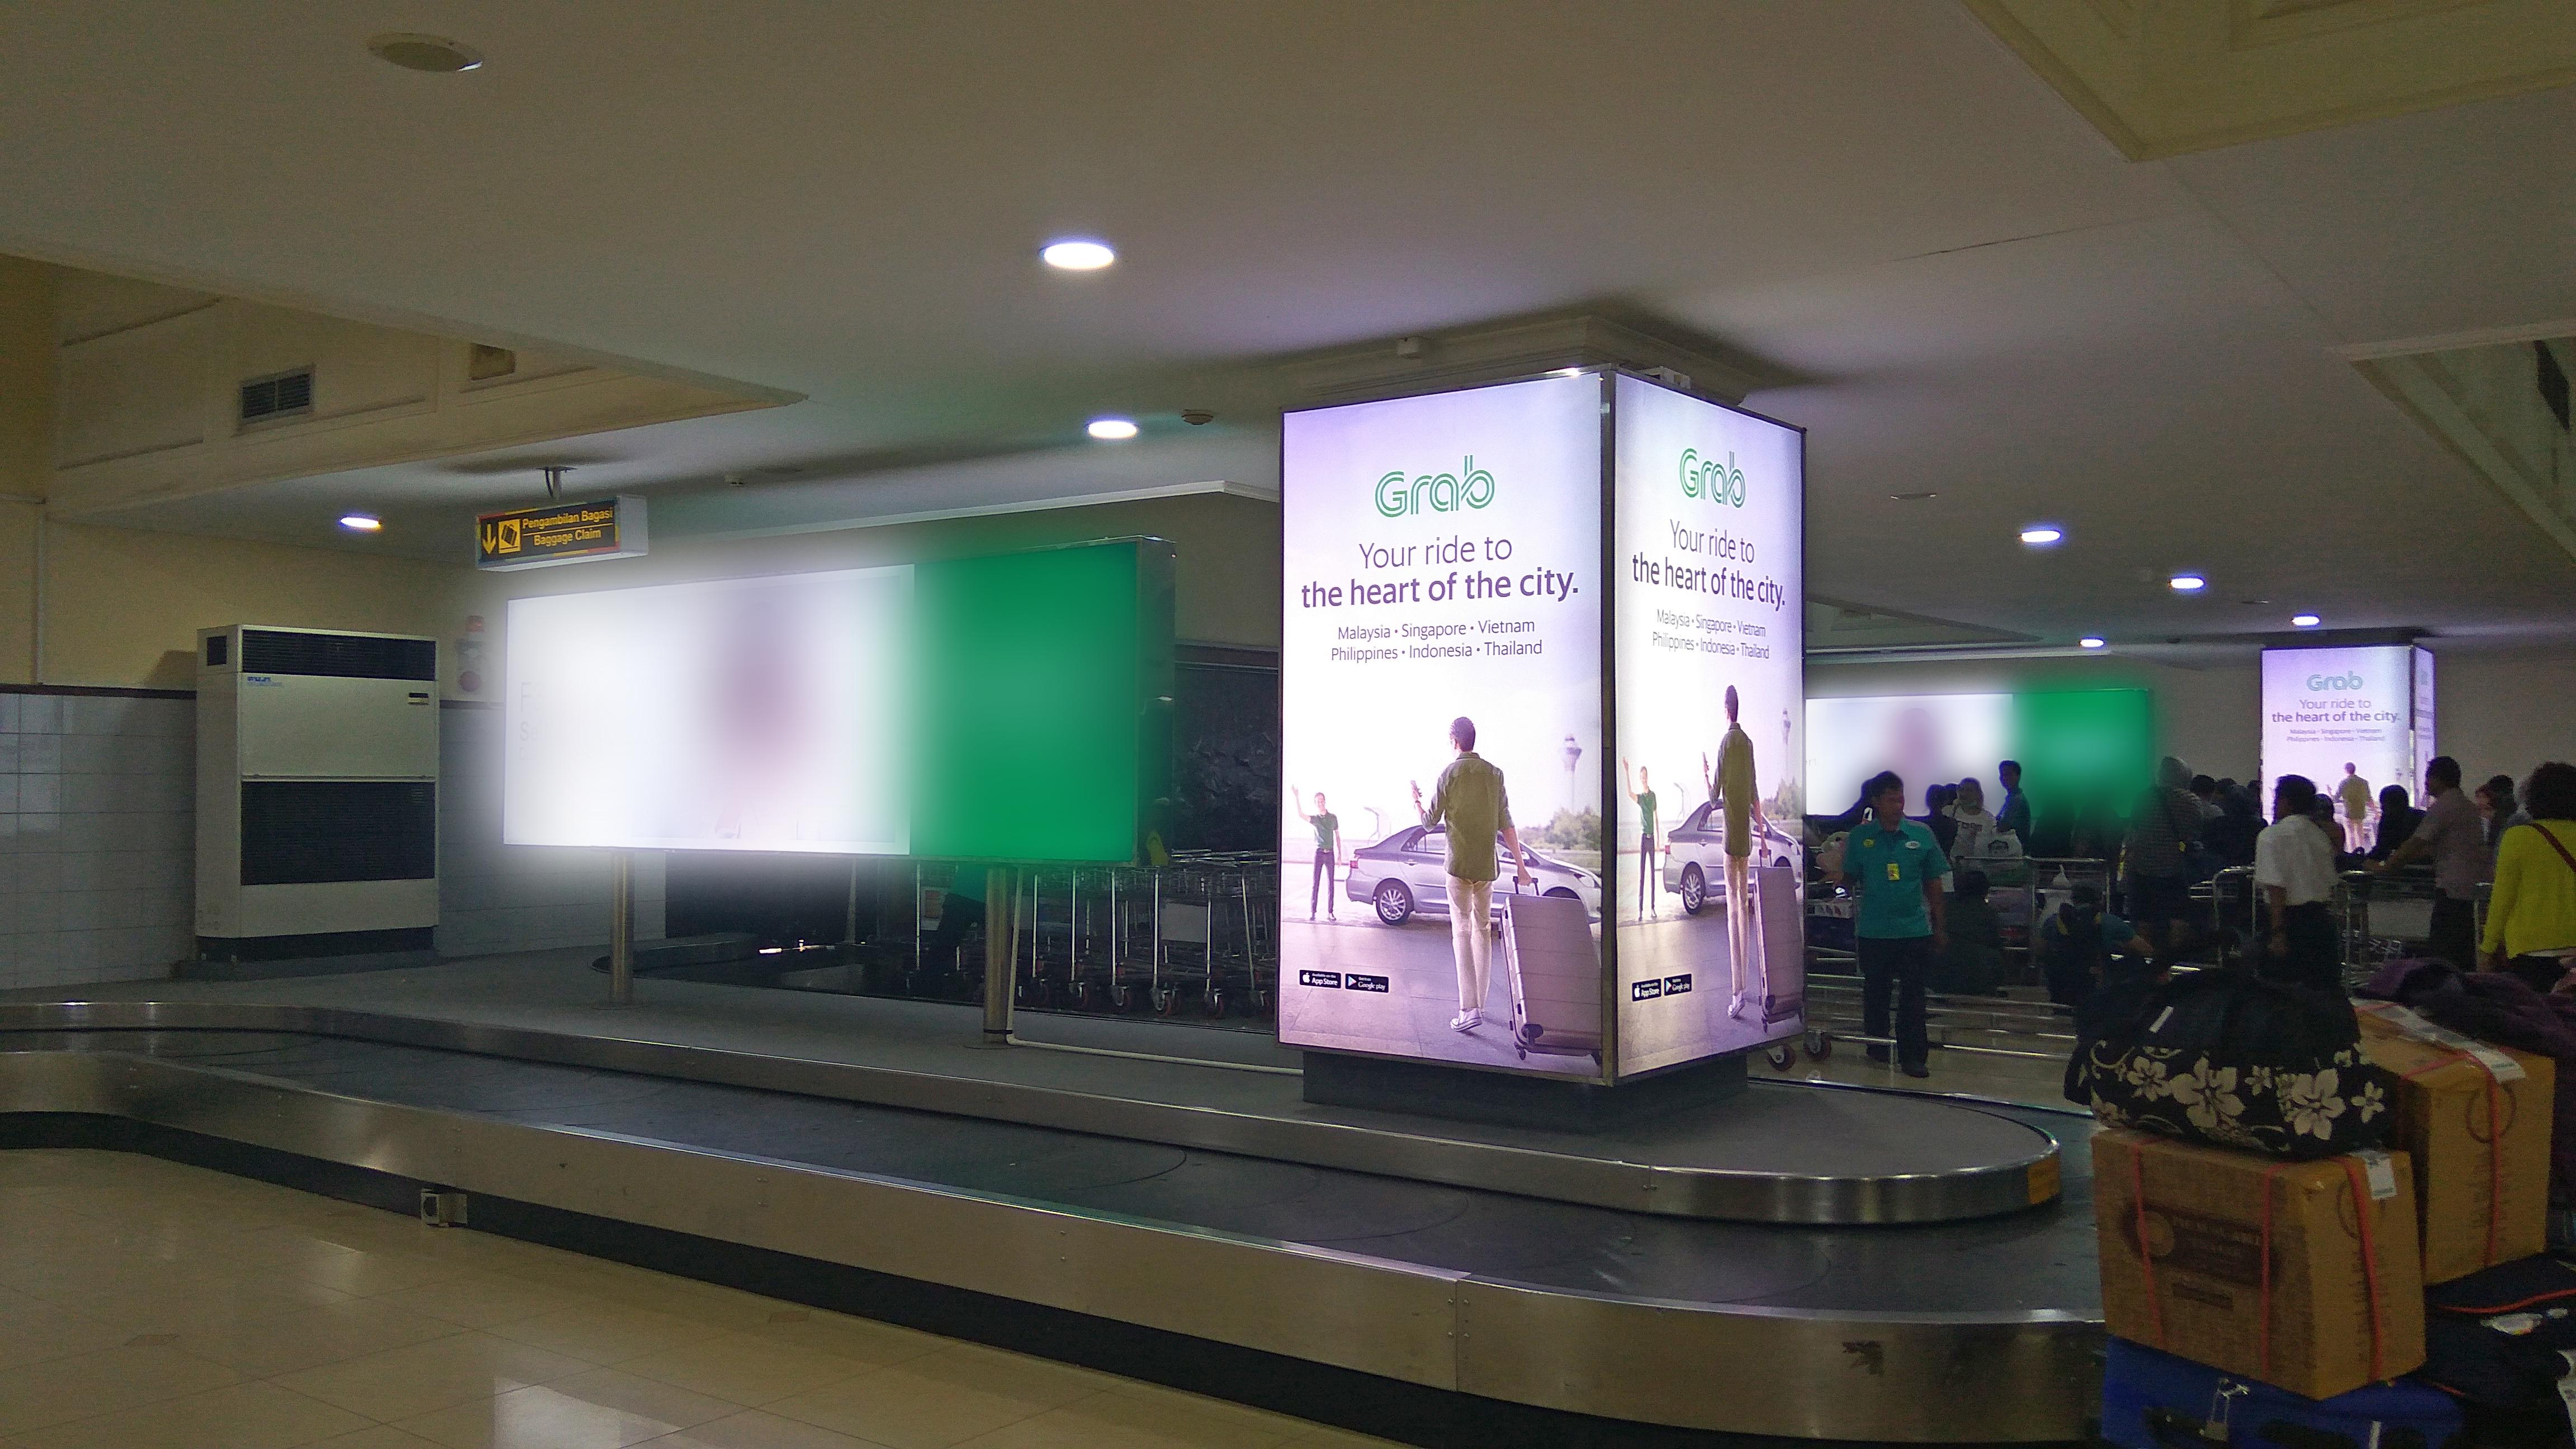 Grab - Halim Perdana Kusuma International Airport Jakarta